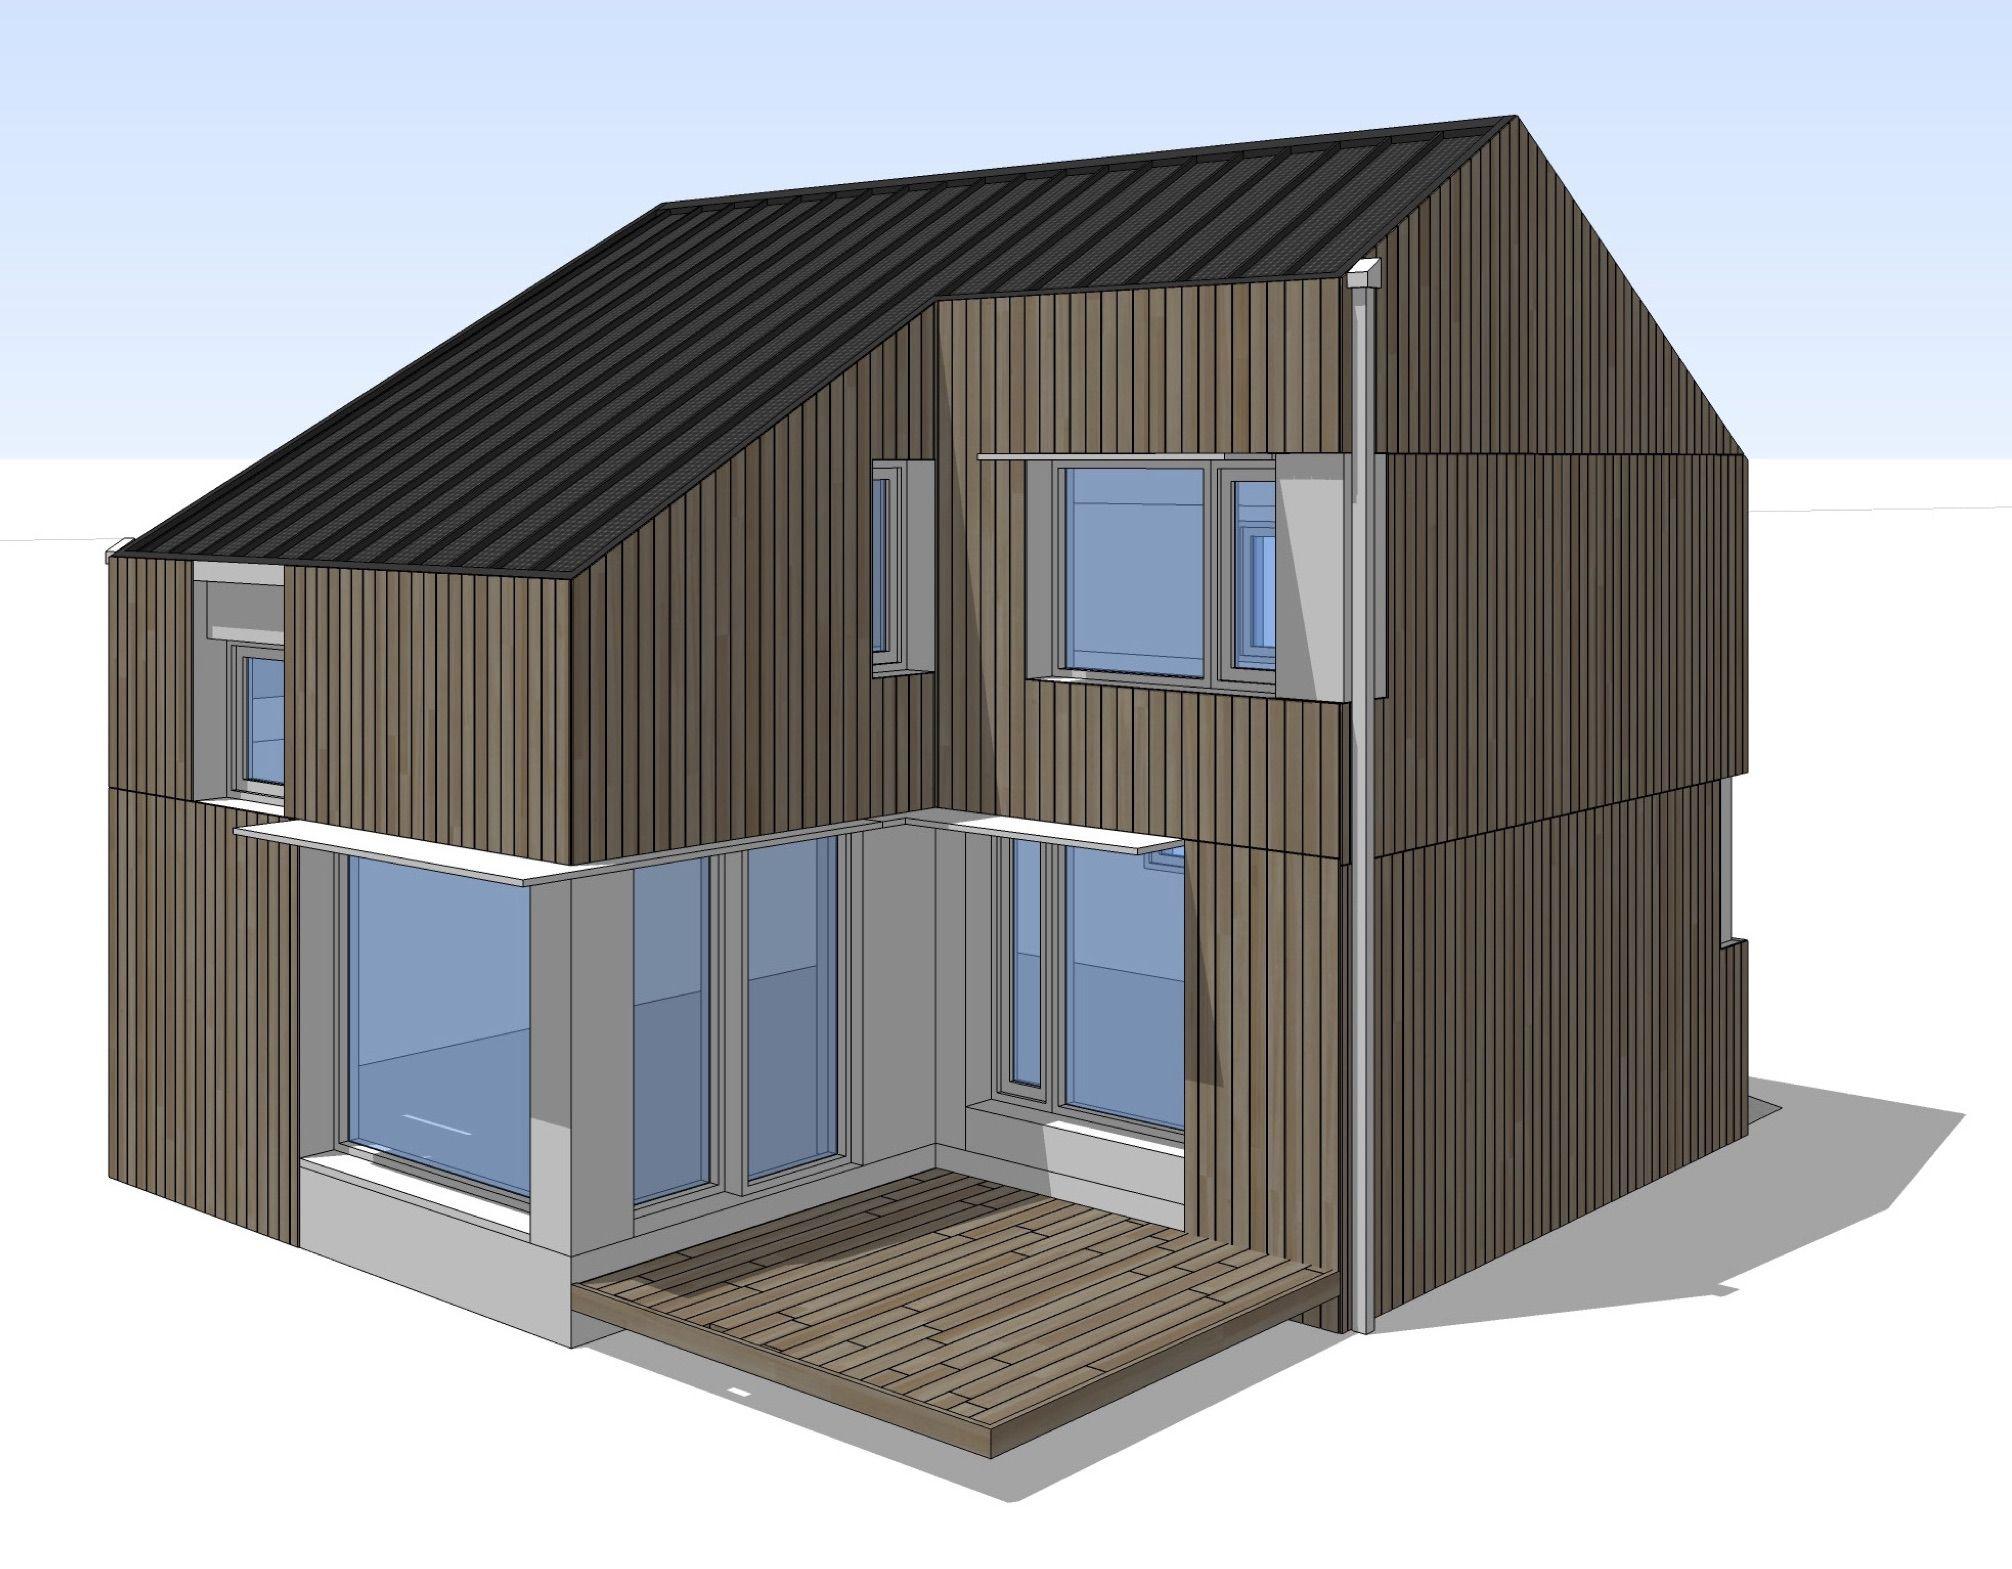 Innovative green building net zero energy zero carbon for Zero footprint homes